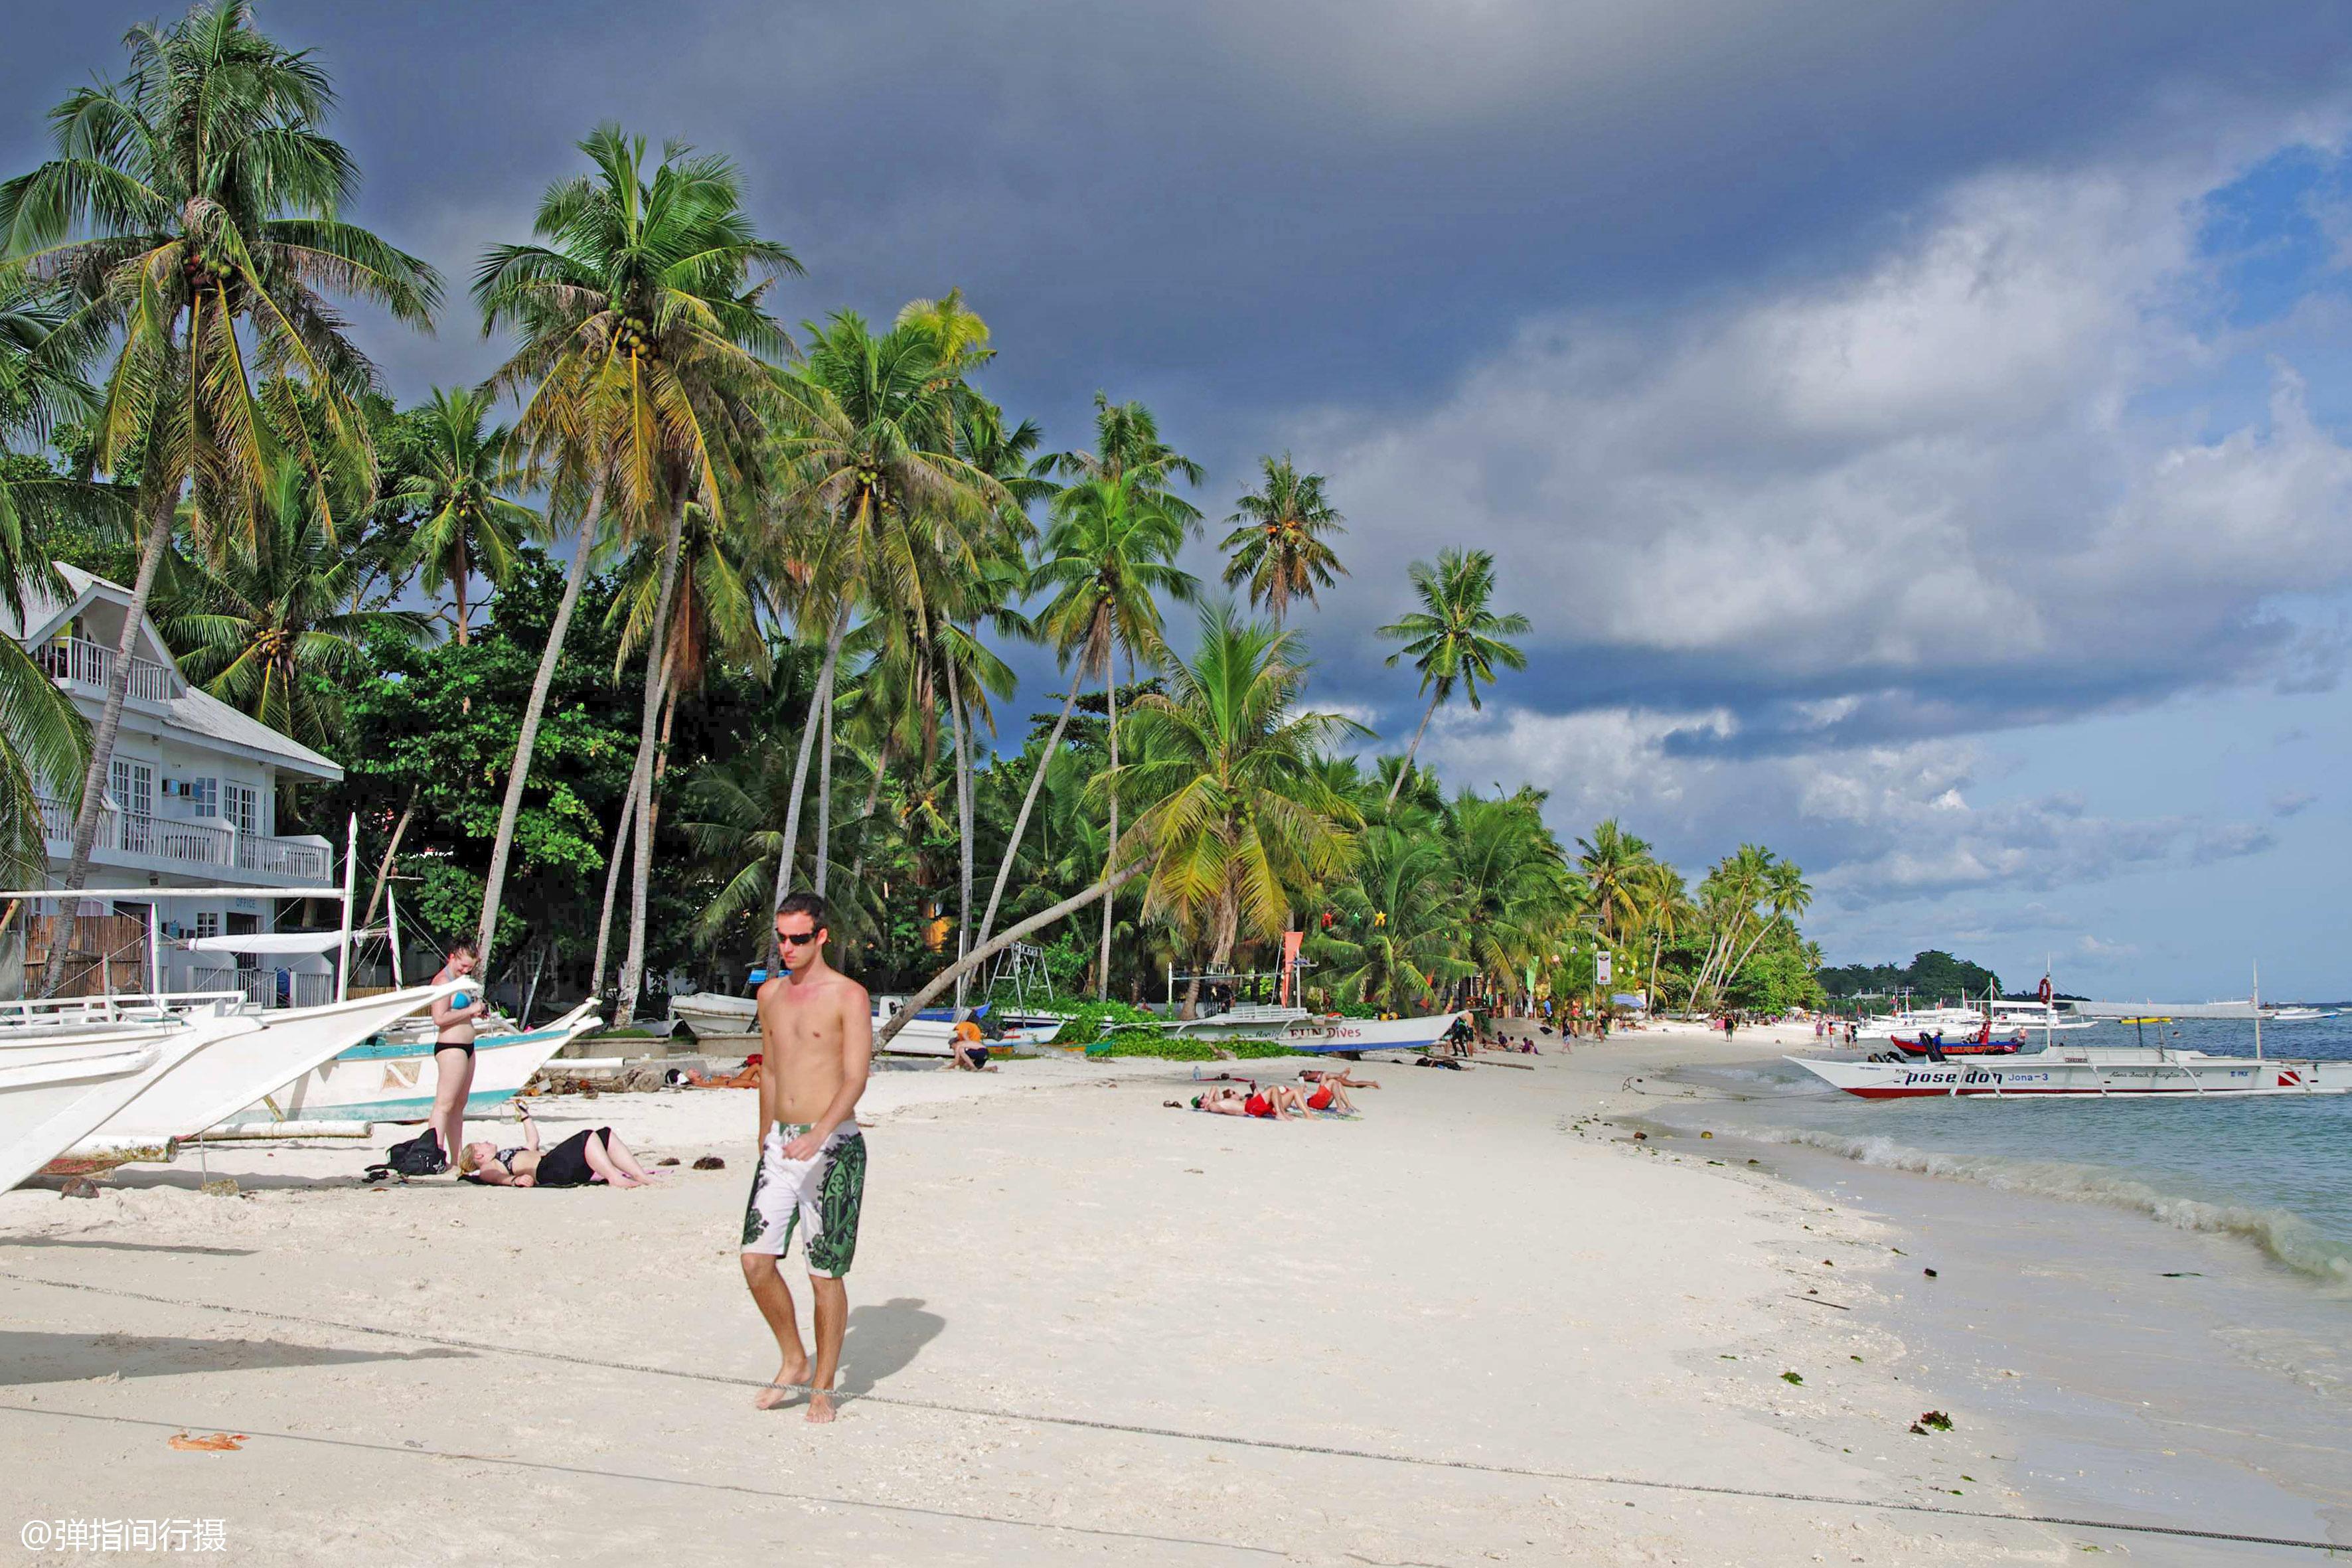 "<b>菲律宾最美海岛,有个清凉名字叫""薄荷"",成西方游客享乐秘境</b>"